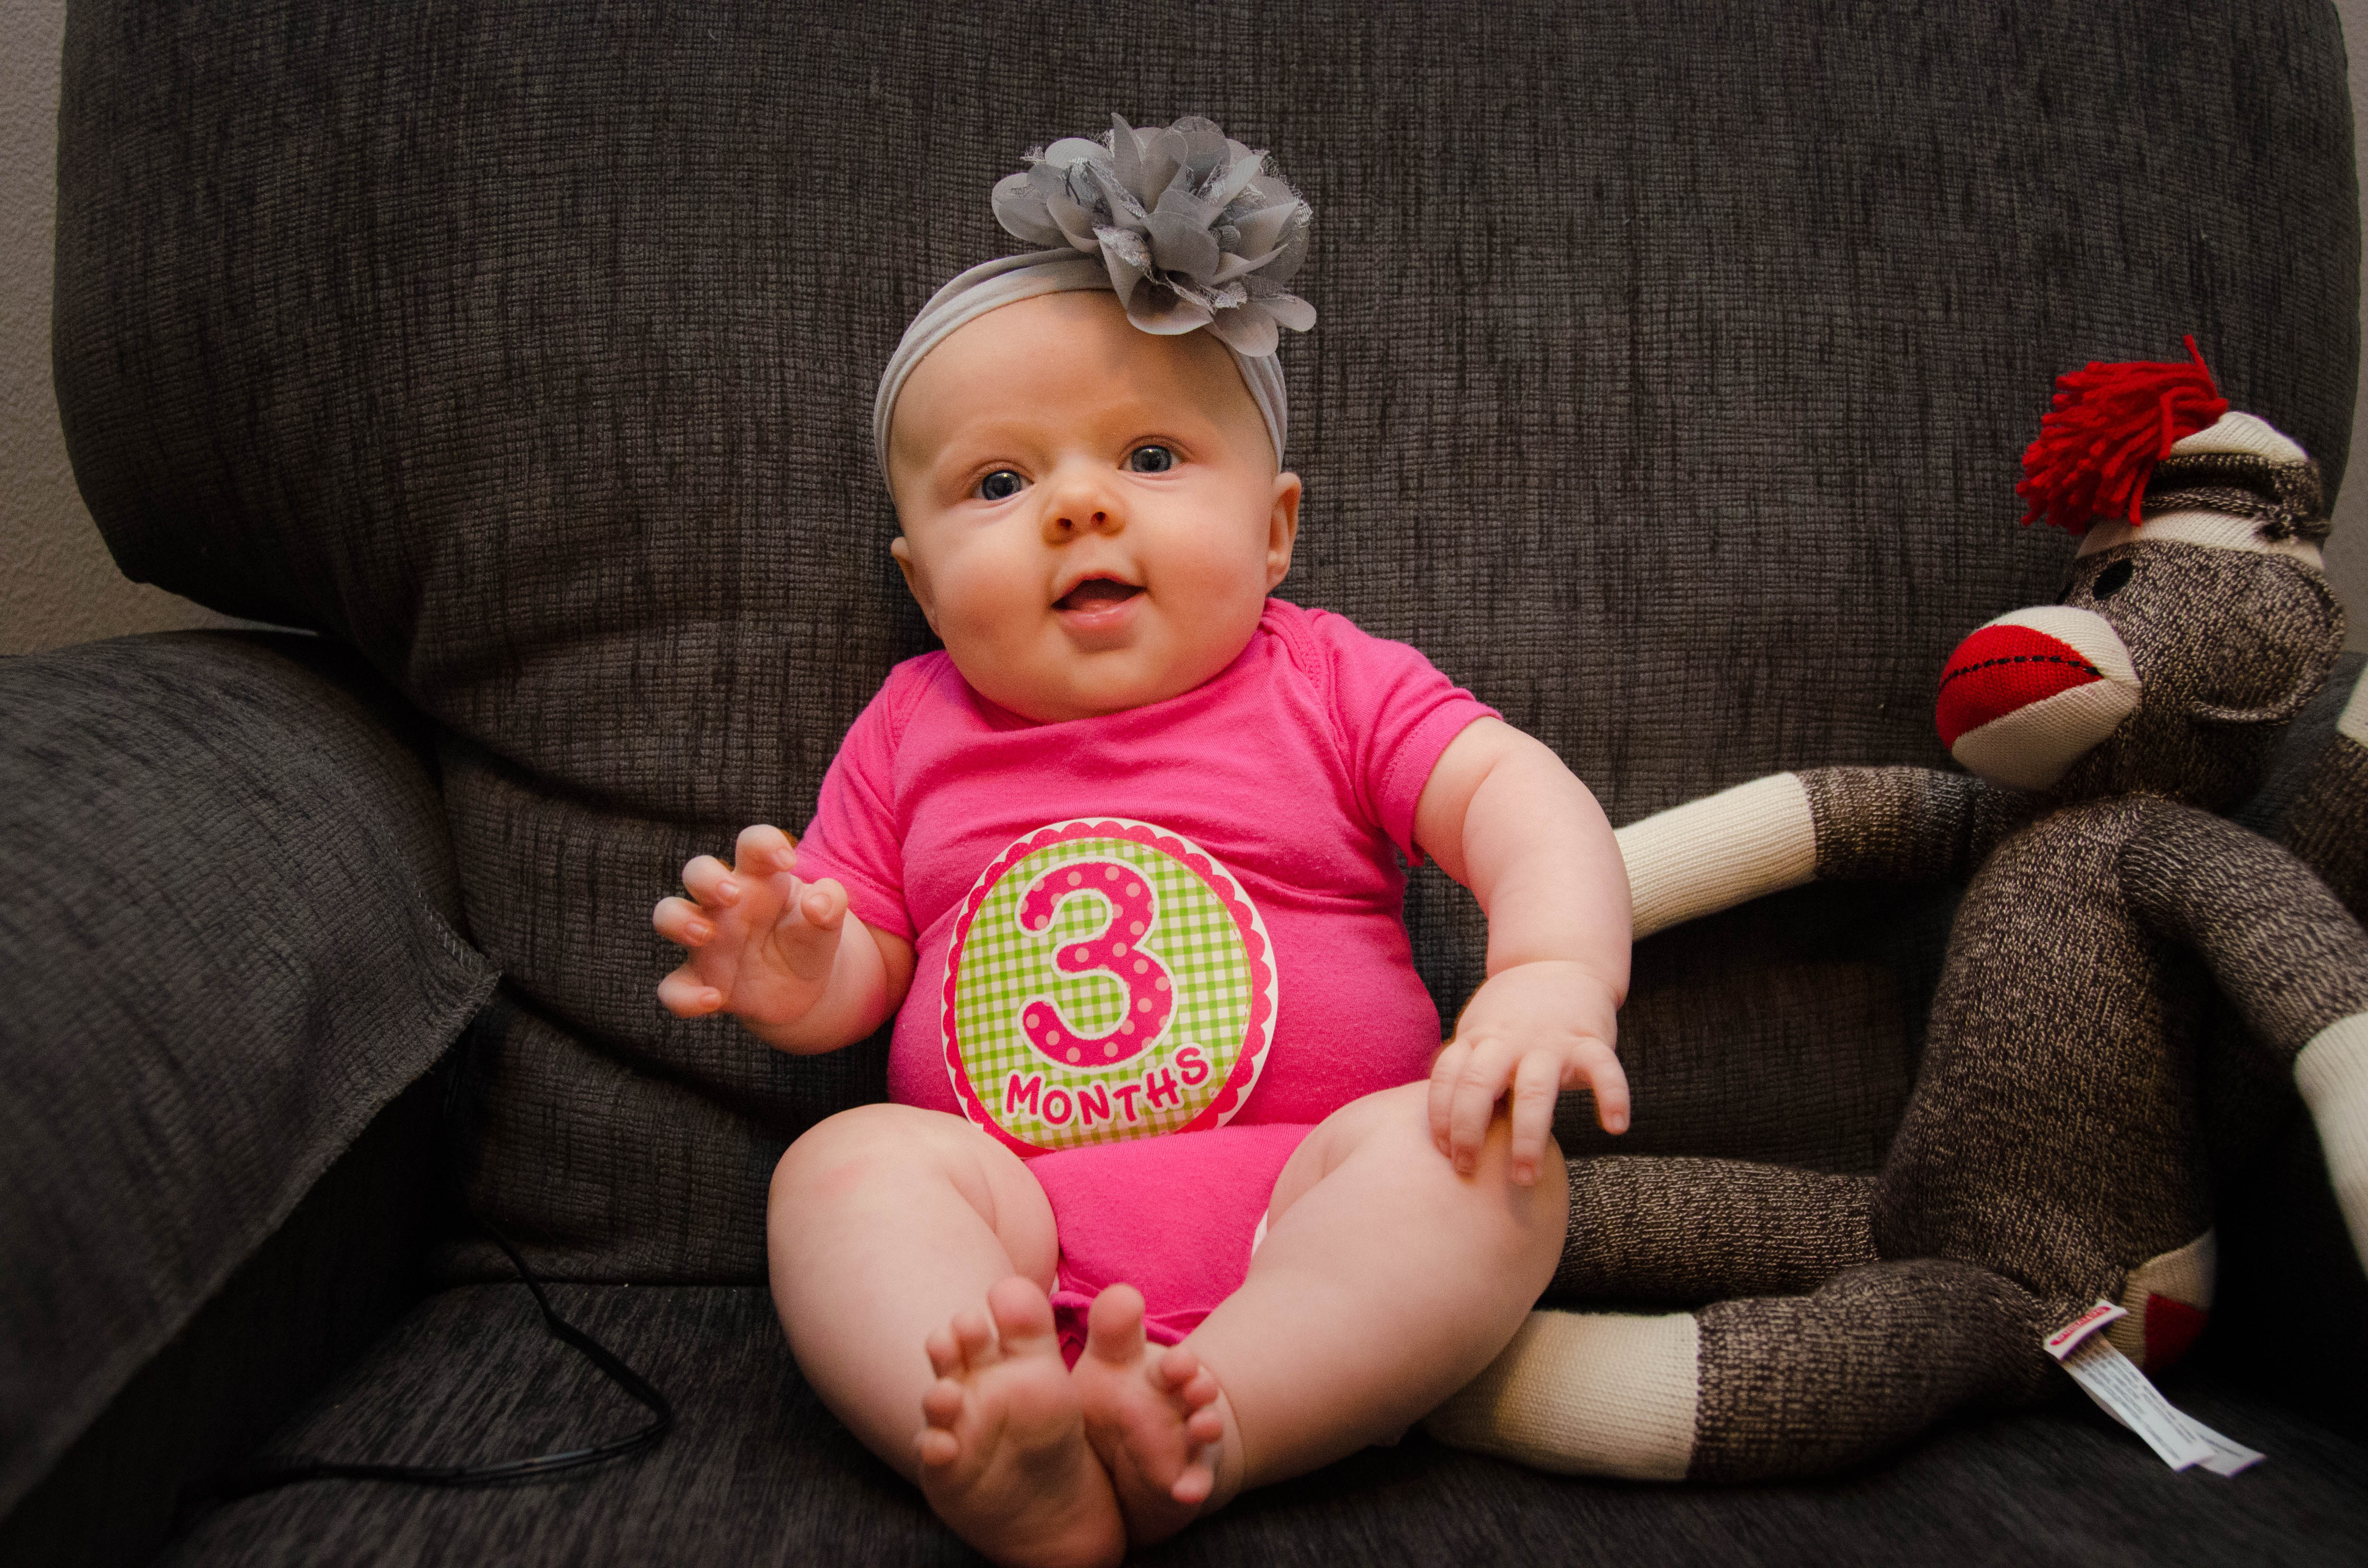 3 месяца ребенок